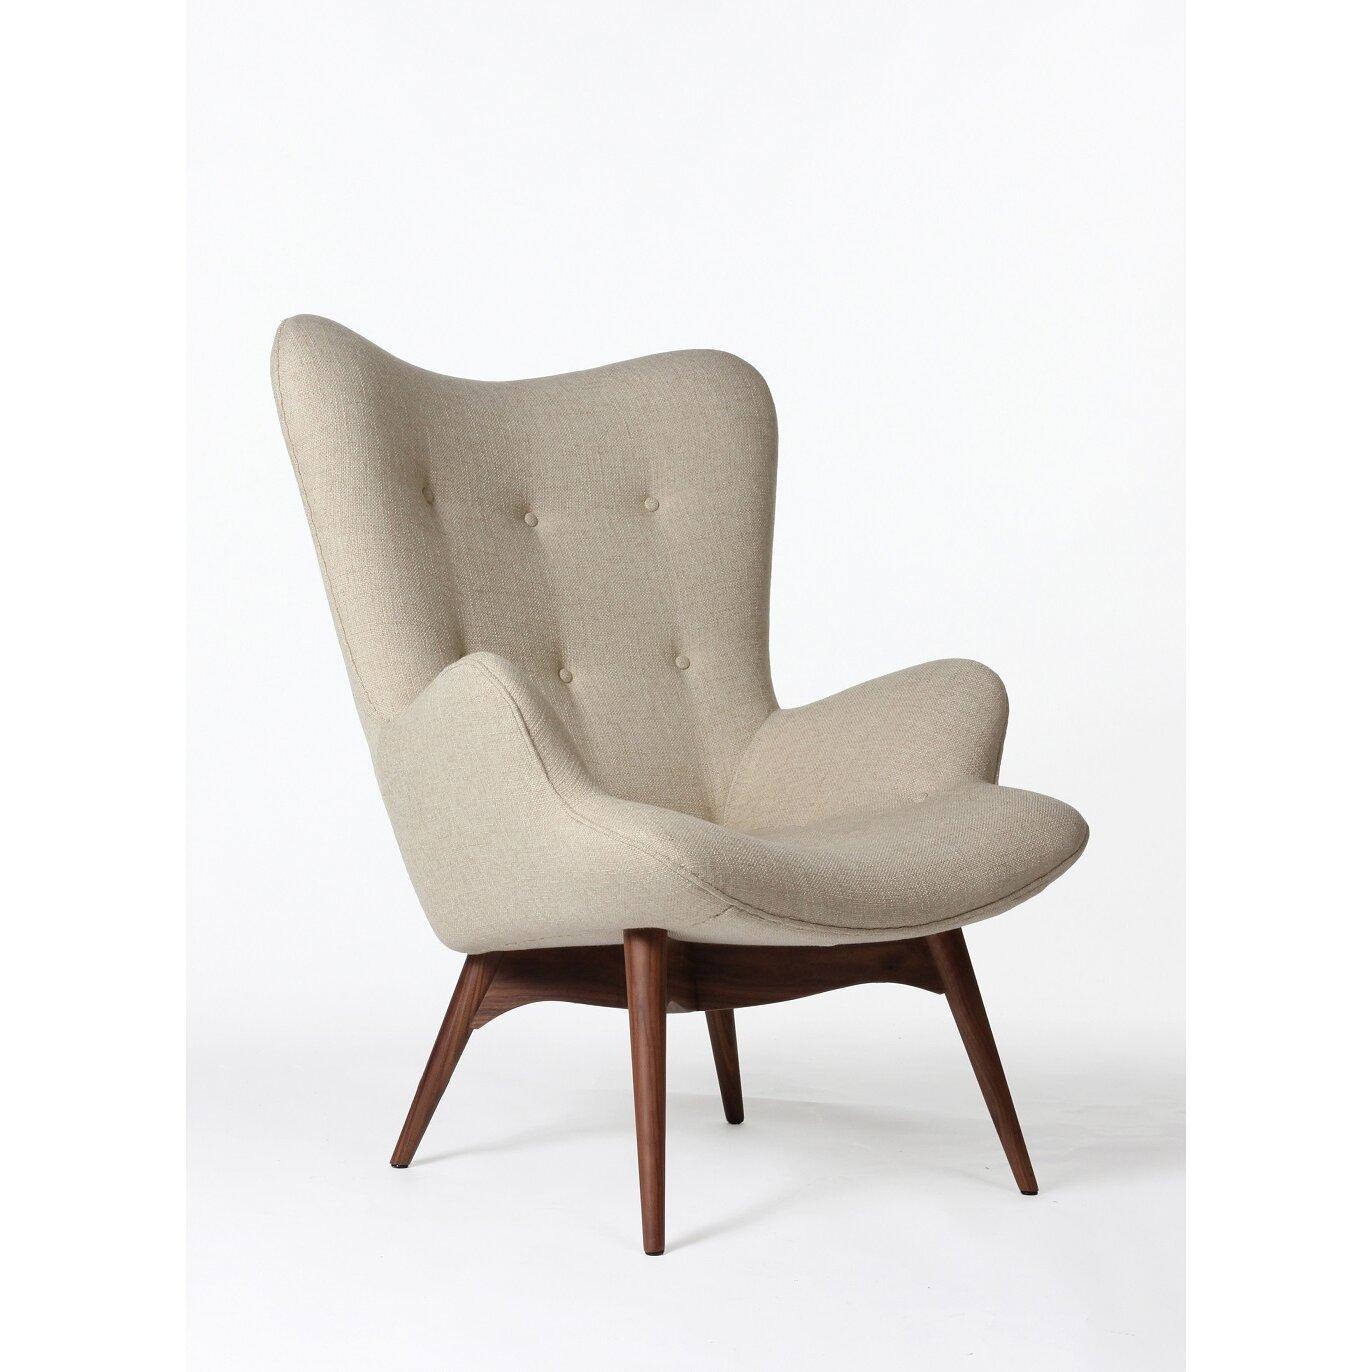 the teddy bear arm chair wayfair. Black Bedroom Furniture Sets. Home Design Ideas